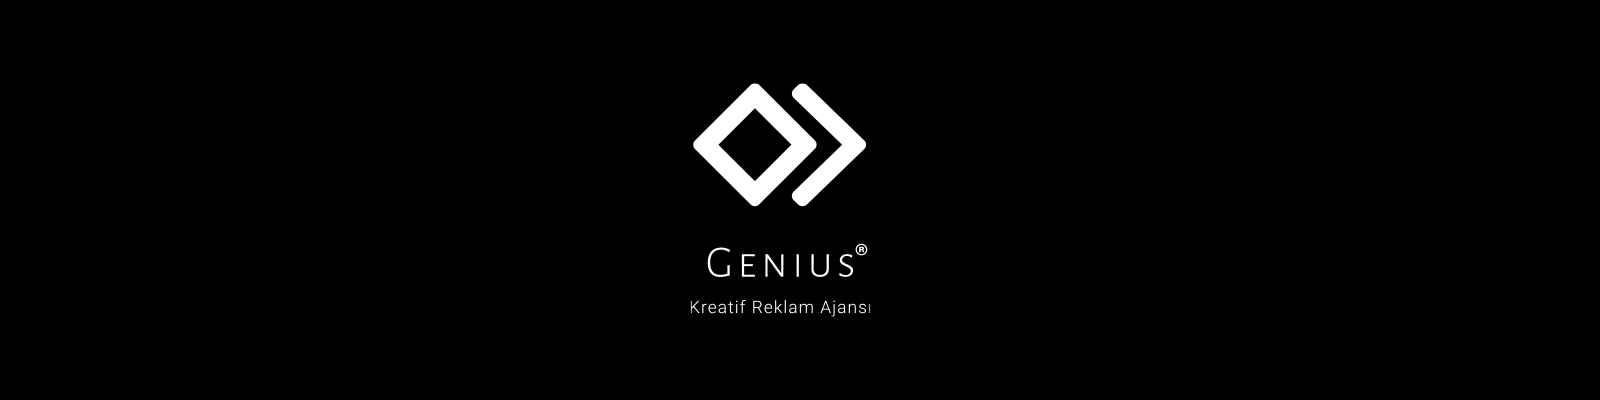 Genius Kreatif Reklam Ajansı banner fotograf